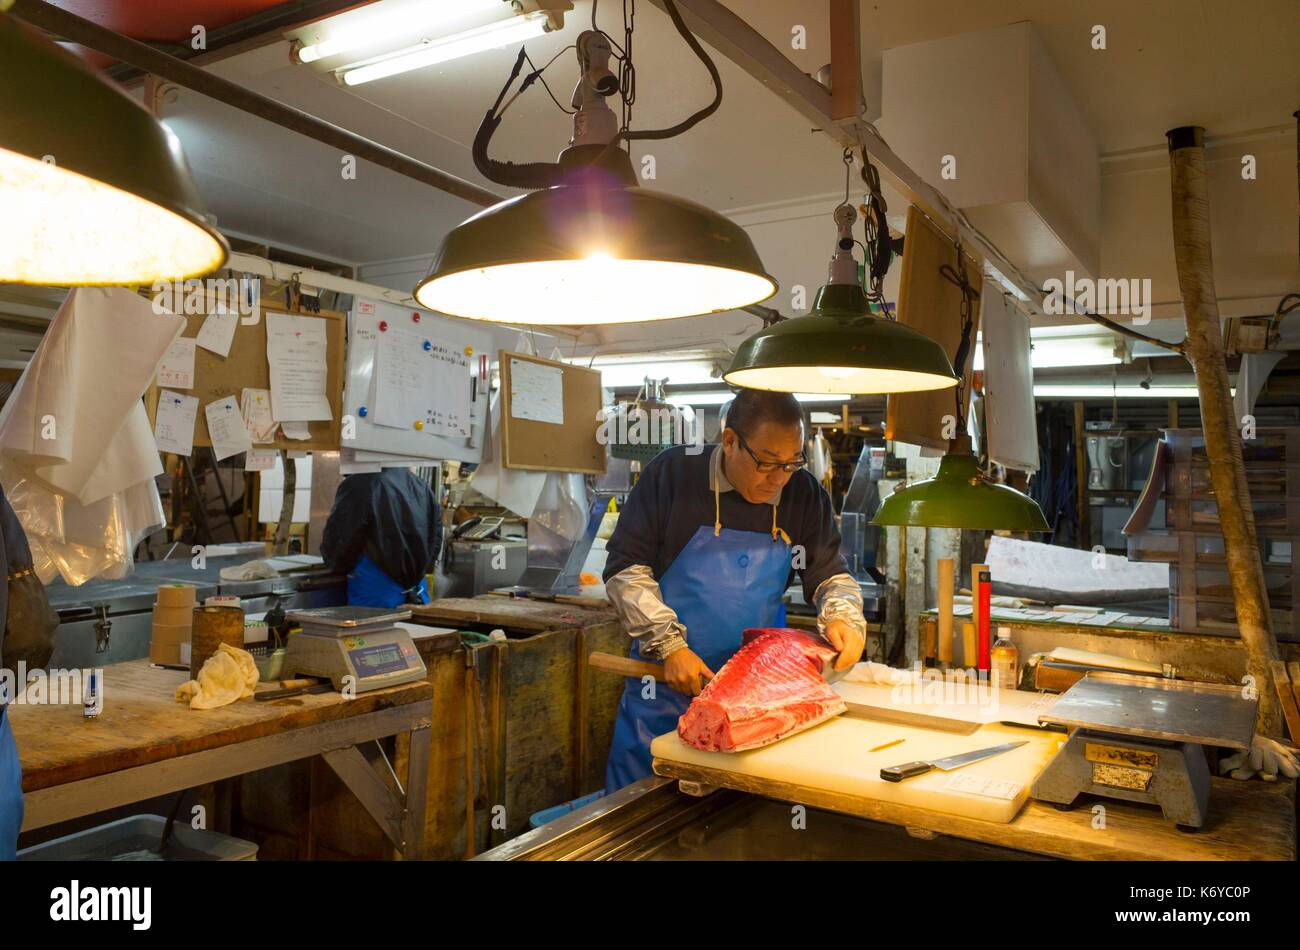 Billion dollar stock photos billion dollar stock images for Wholesale fish market los angeles